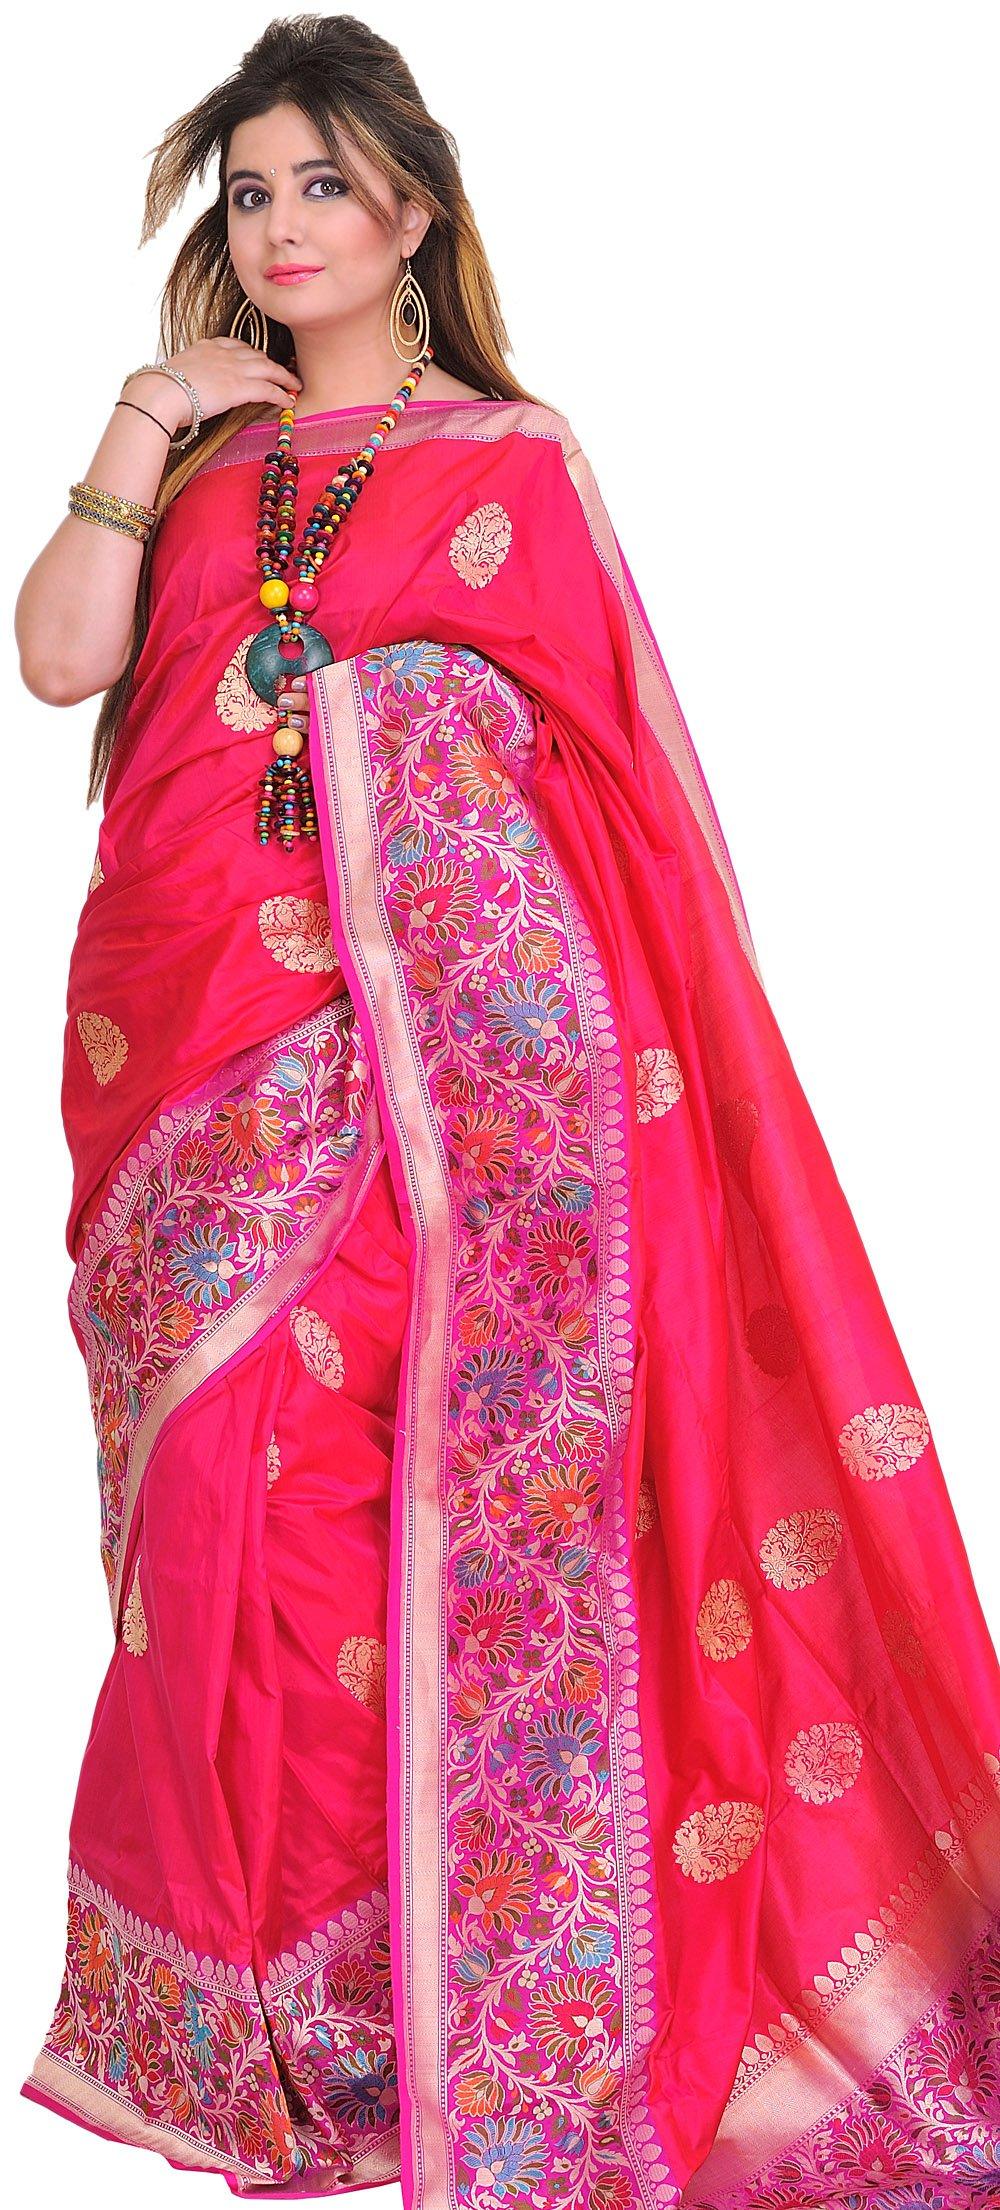 Exotic India Raspberry-Sorbet Superfine Sari From Banaras With Wide Kadhw - Pink